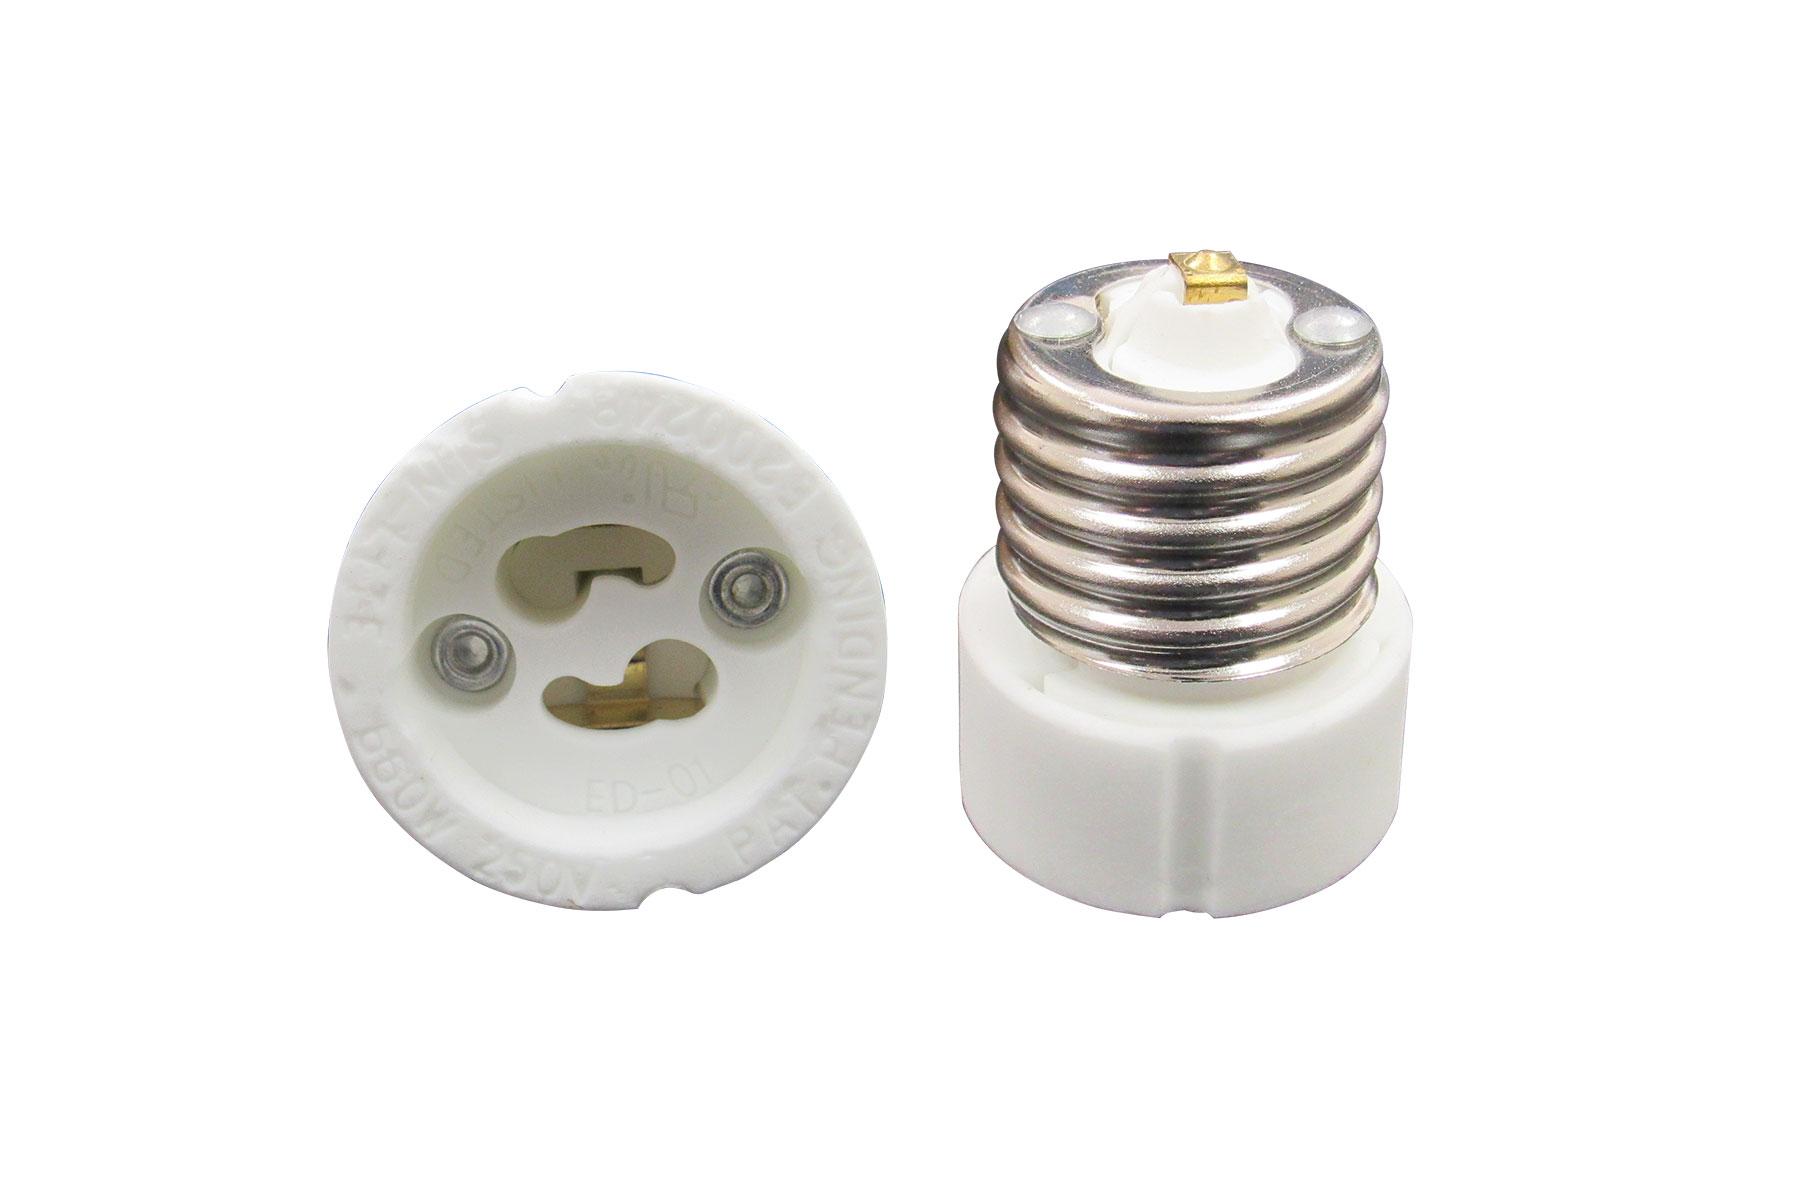 E27 to GU10 Light Bulb Socket Adapter